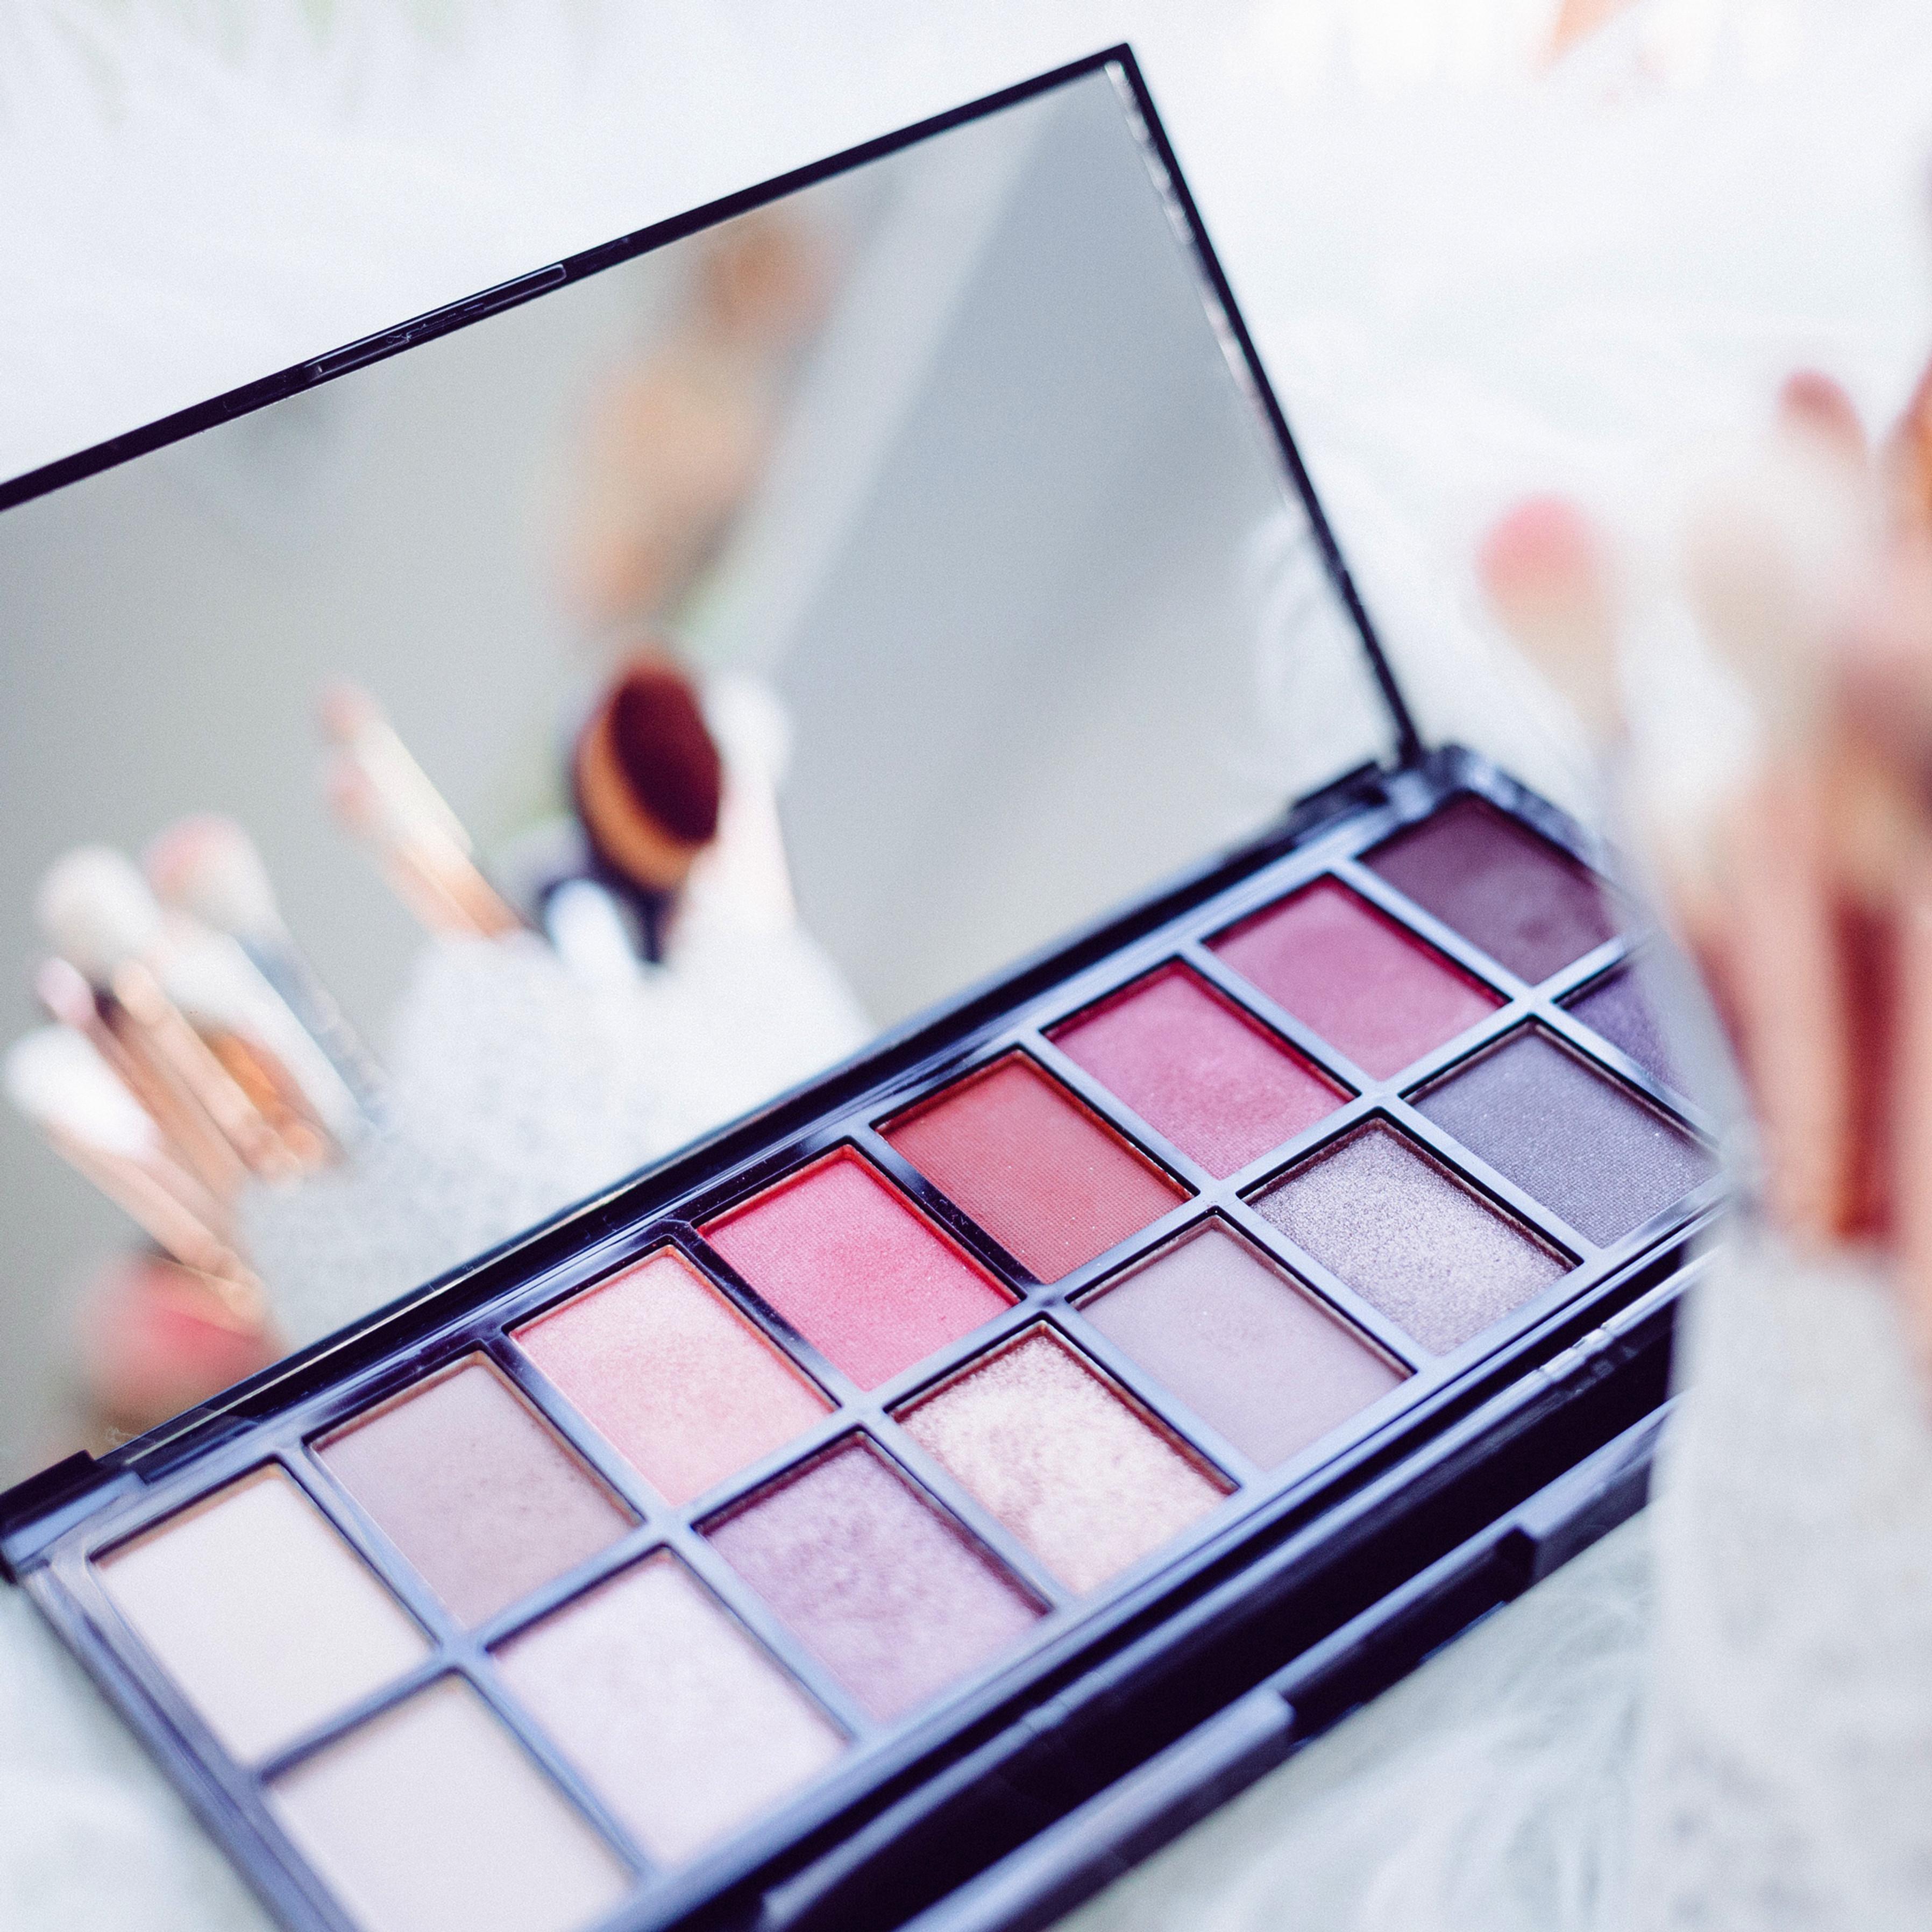 High Glam Make-up Application